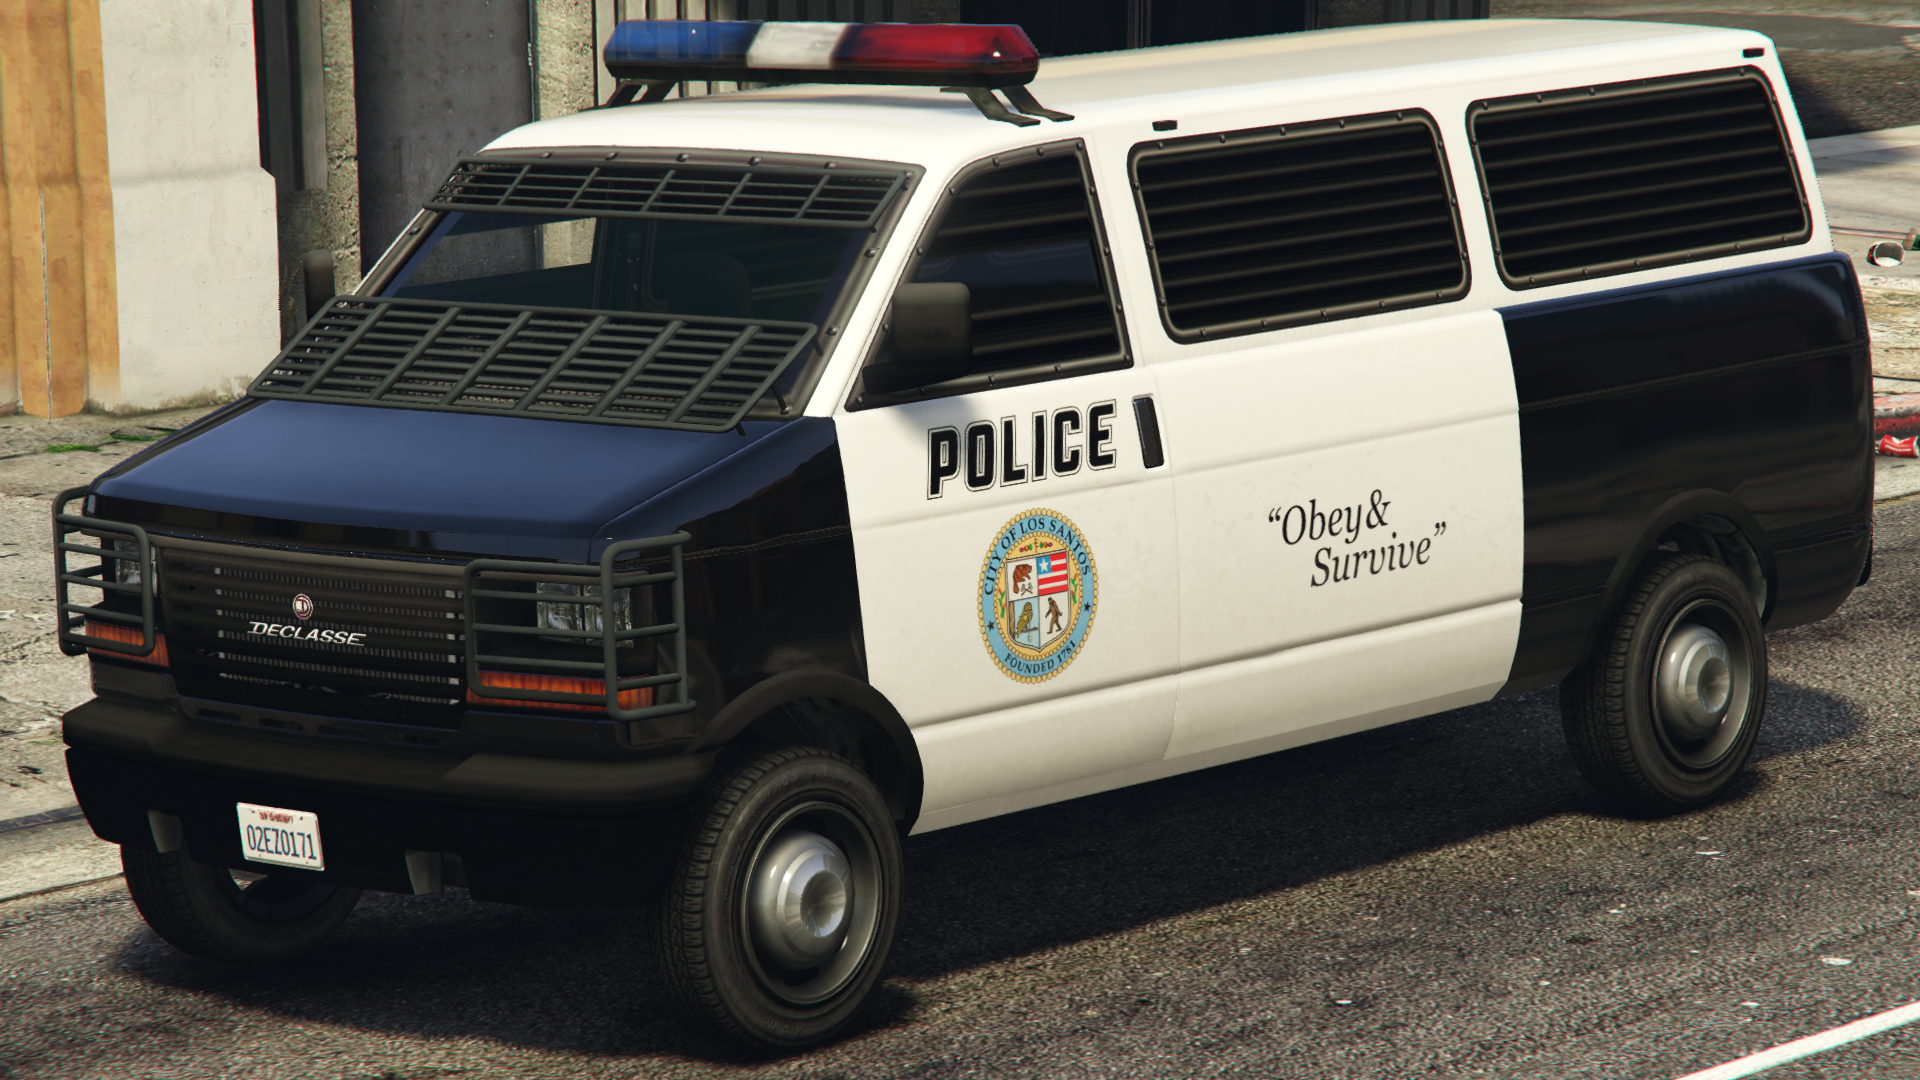 Police Maverick  GTA V Wiki  FANDOM powered by Wikia